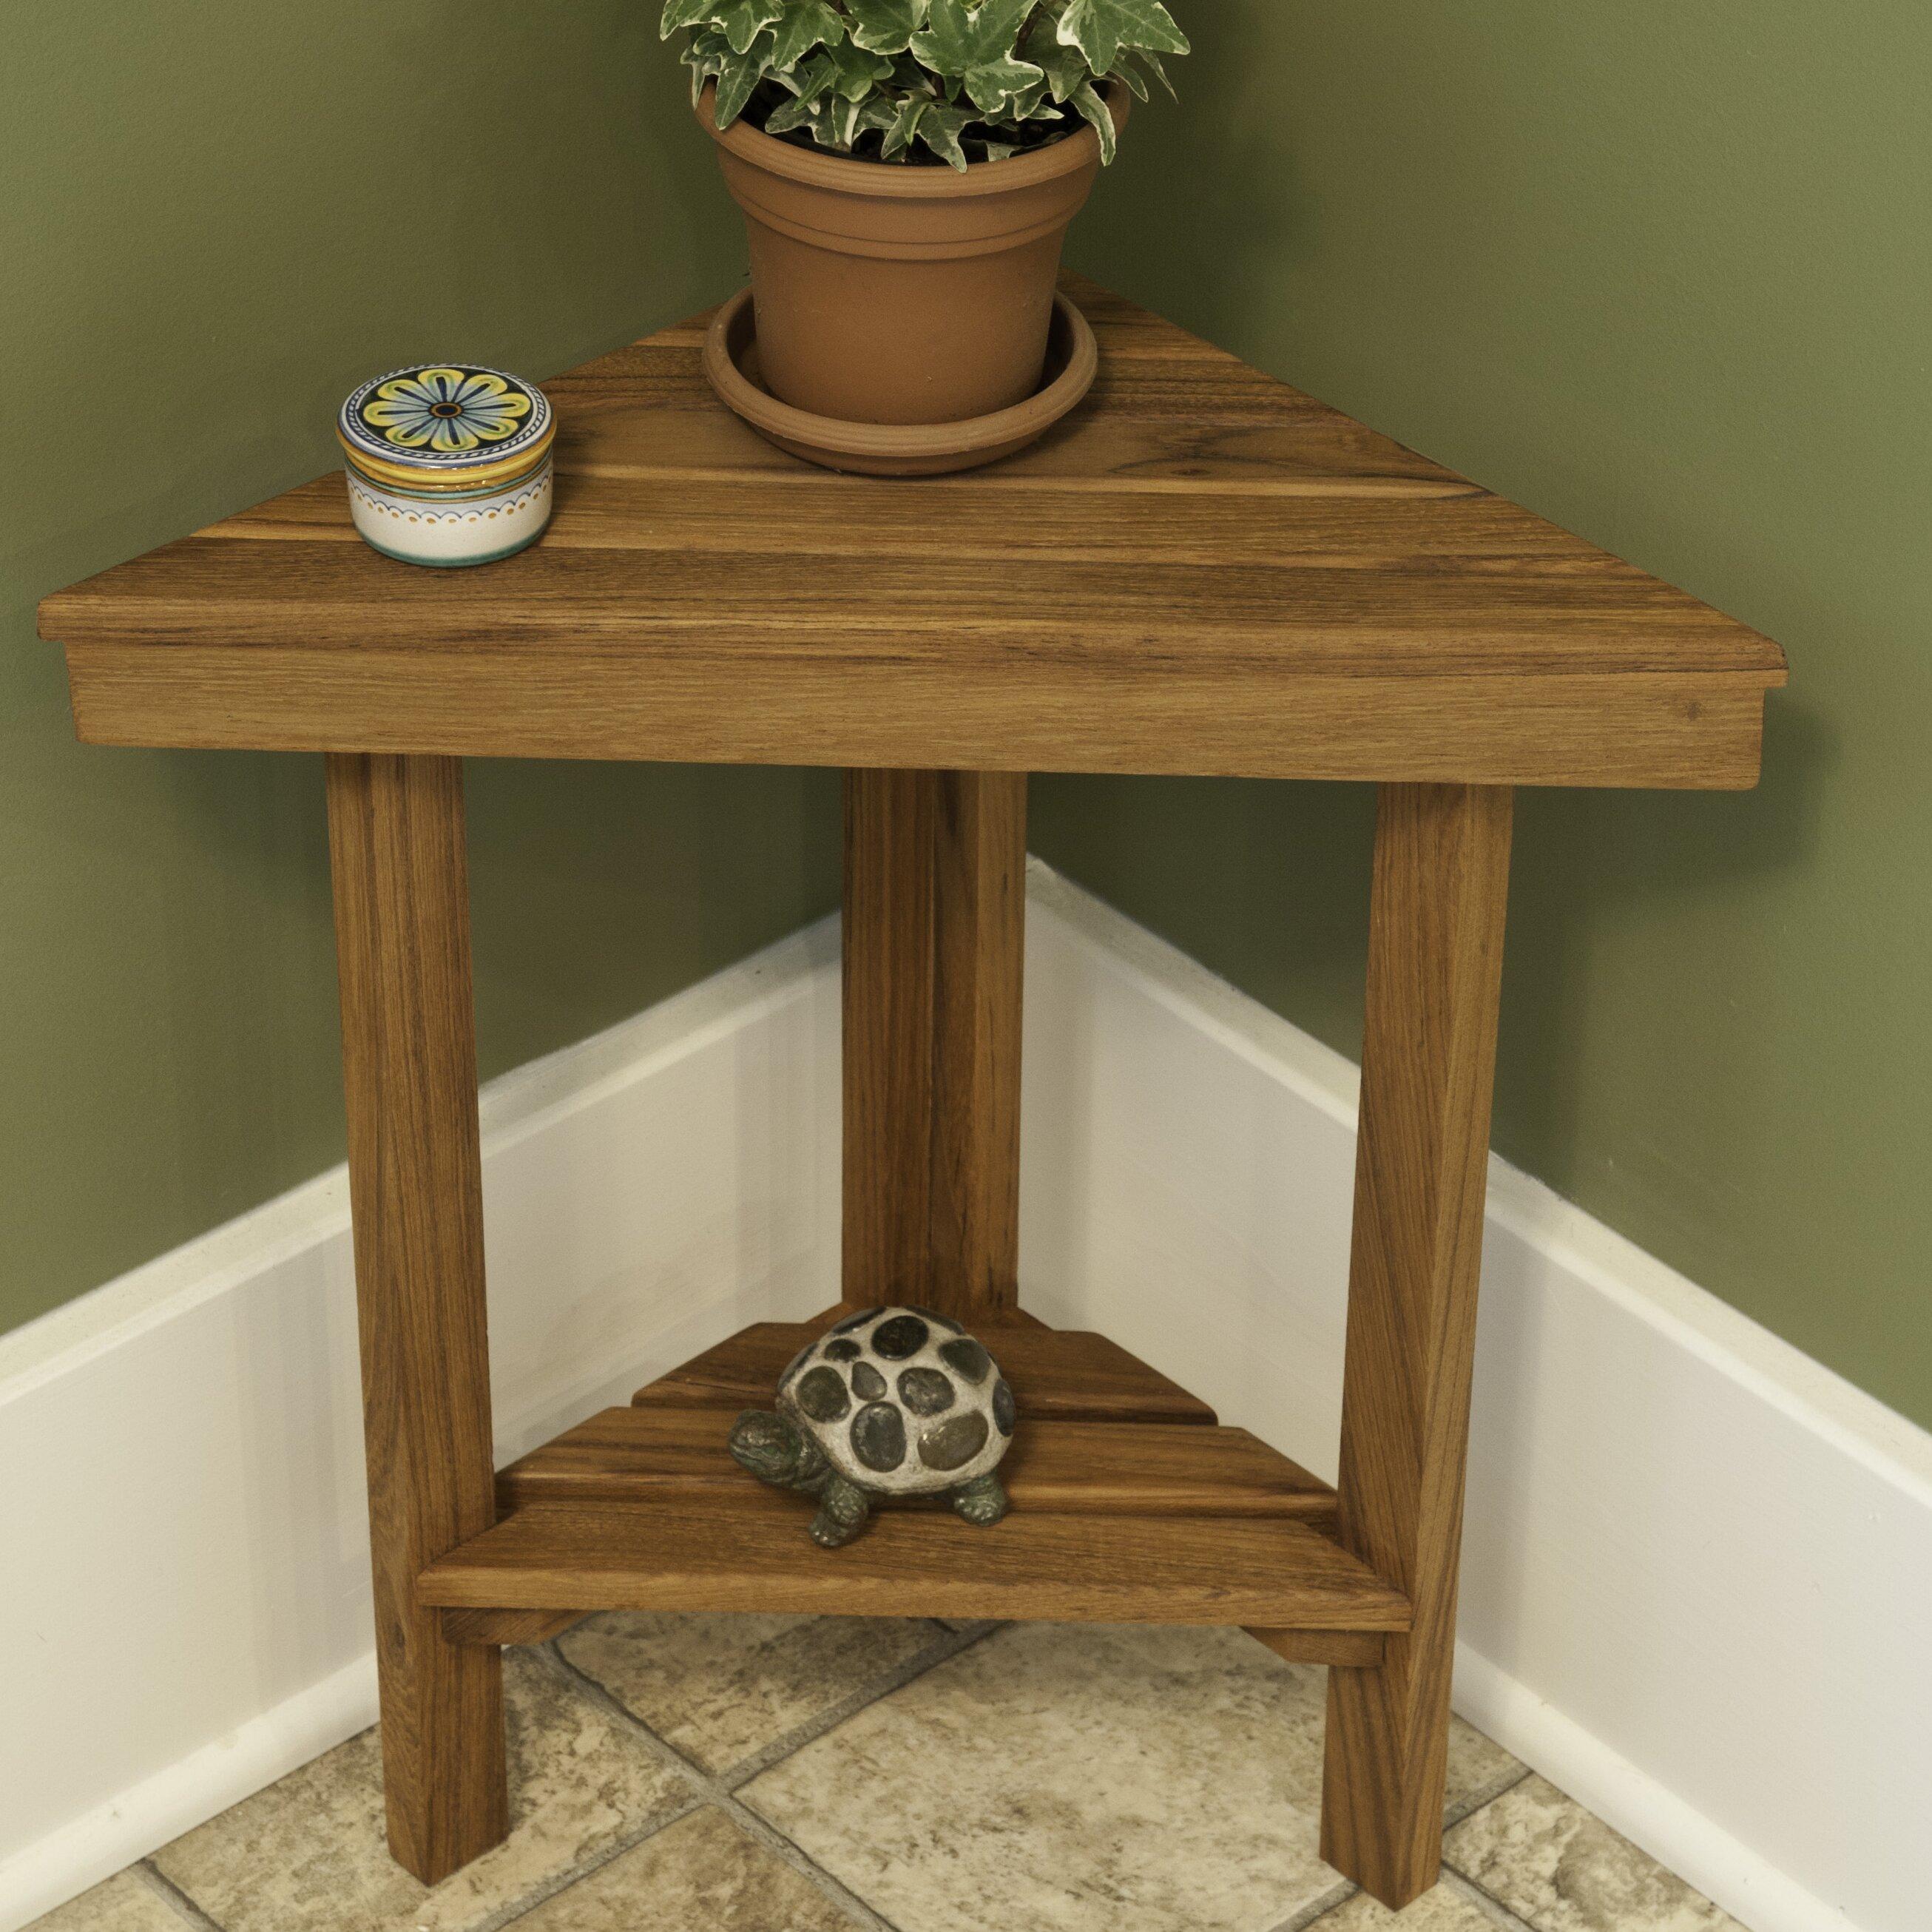 Teakworks4u Teak Mini Corner Shower Bench With Shelf Reviews Wayfair